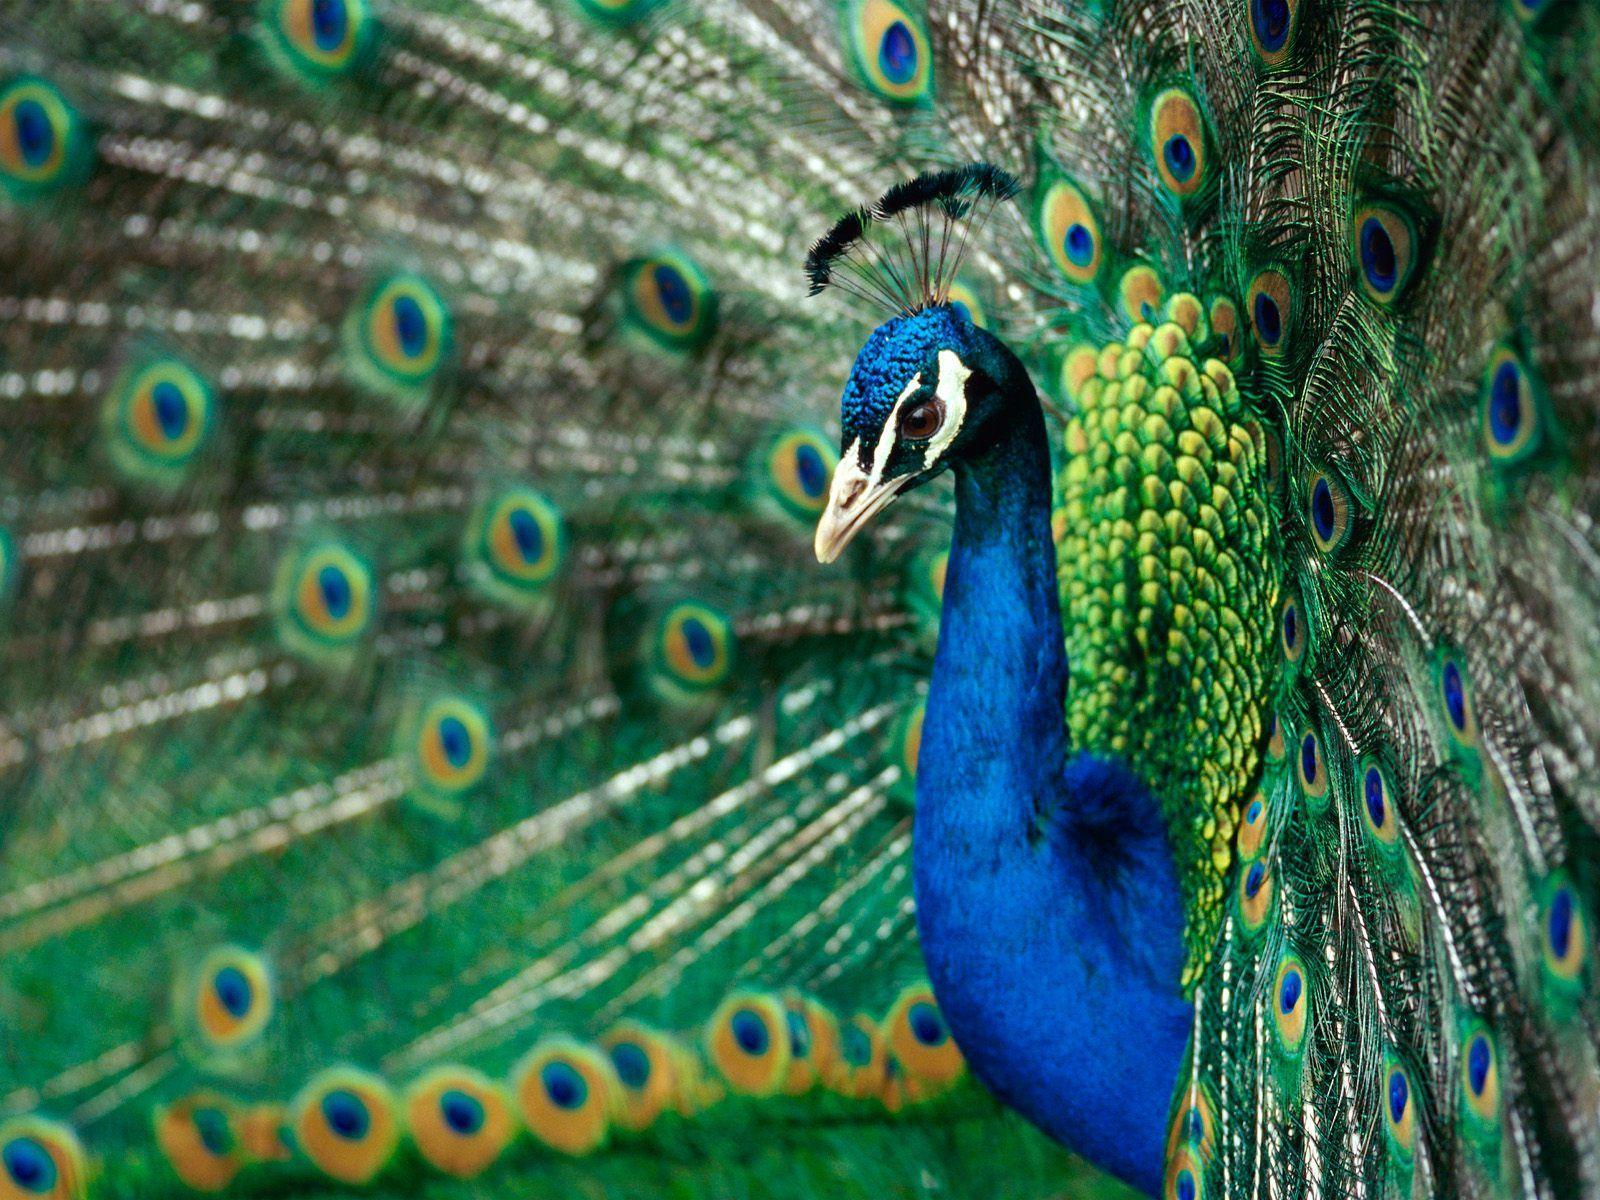 Free Download Wallpaper HD : Peacock Most Beautiful Bird